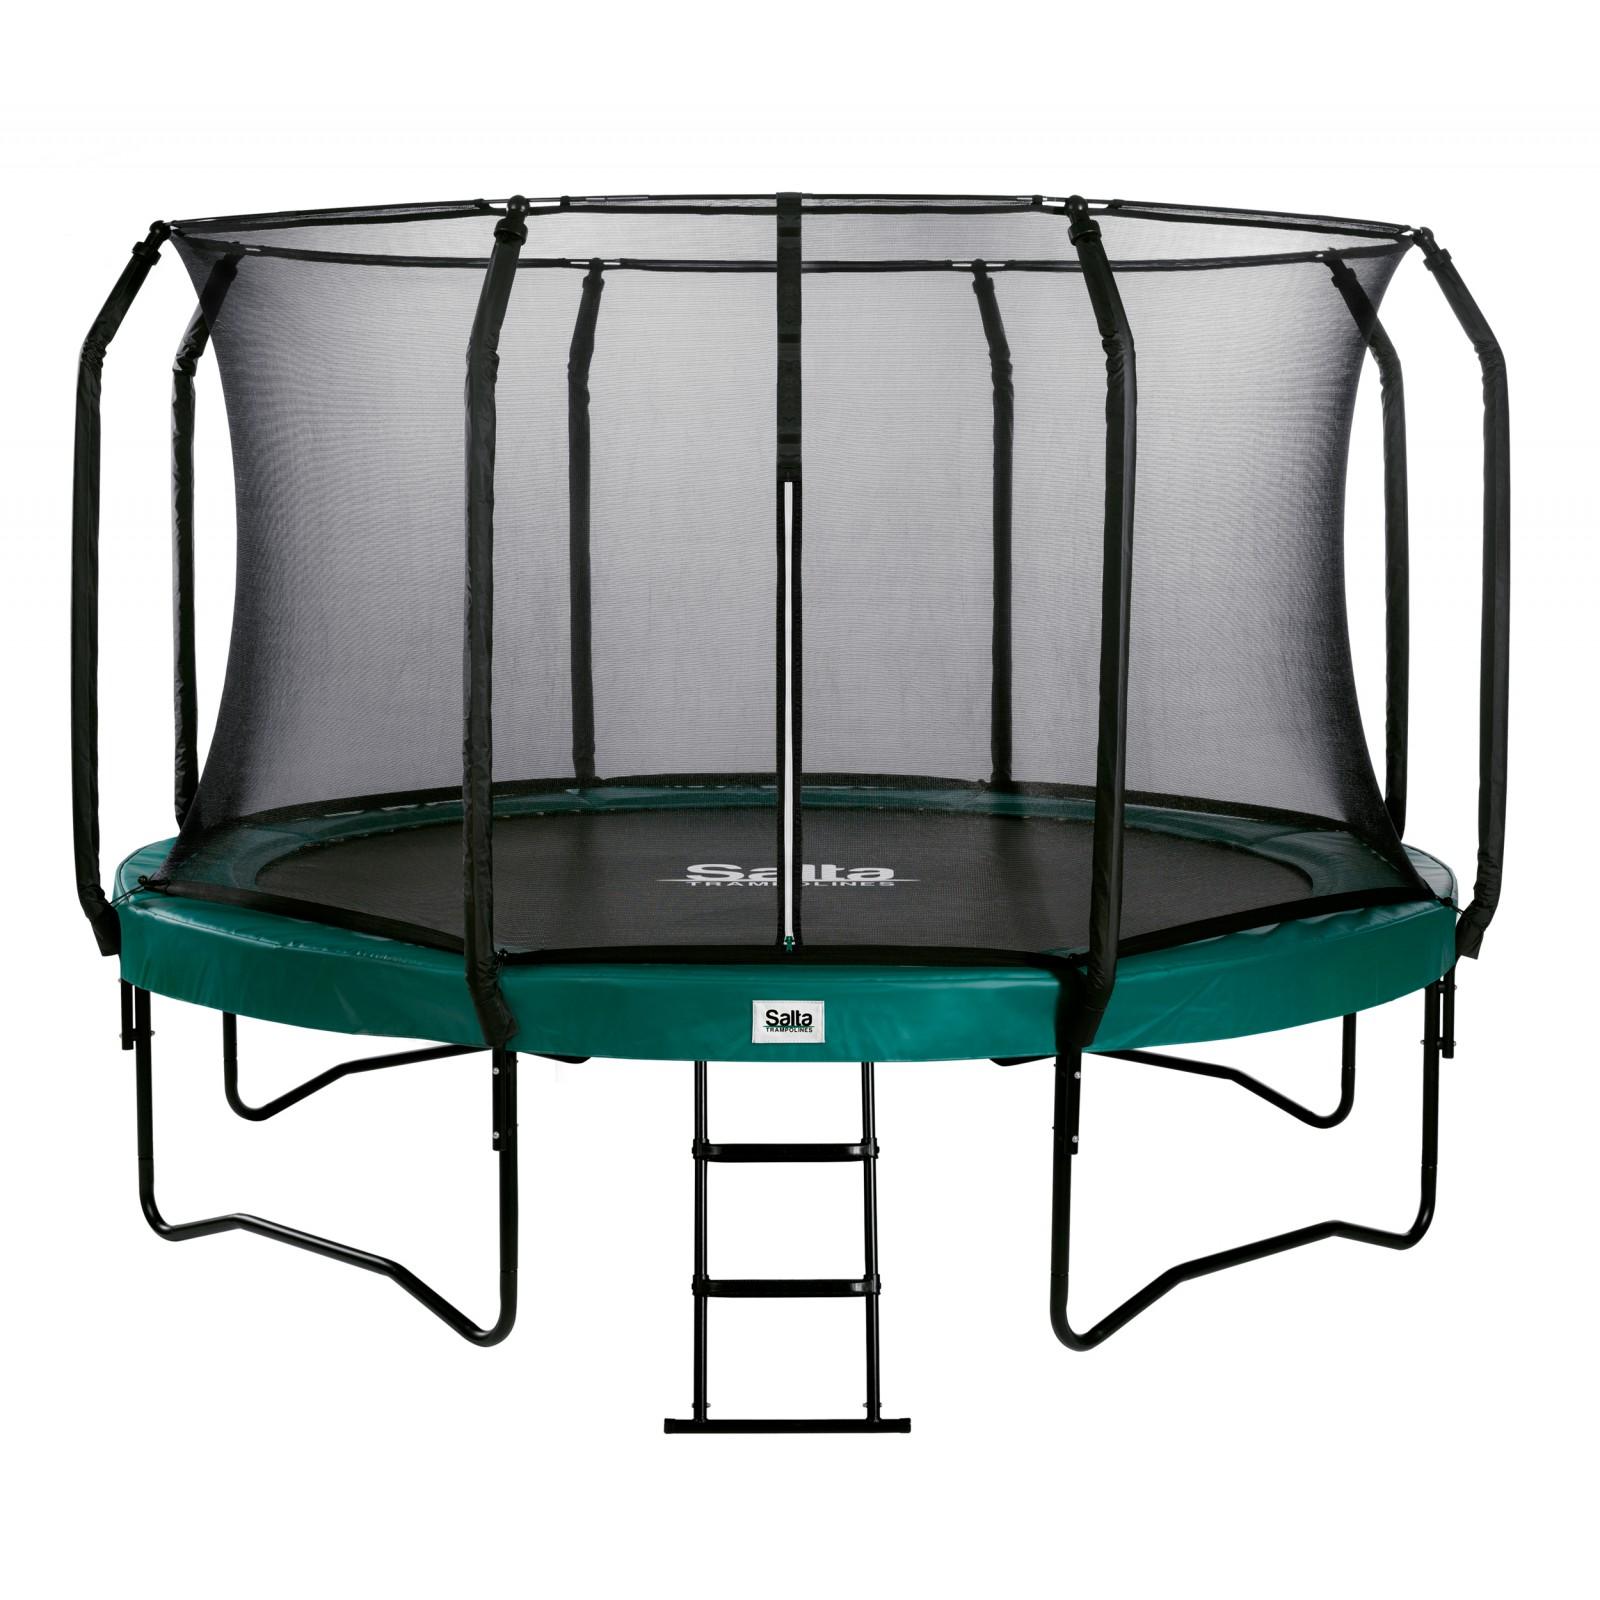 salta trampolin first class g nstig kaufen sport tiedje. Black Bedroom Furniture Sets. Home Design Ideas